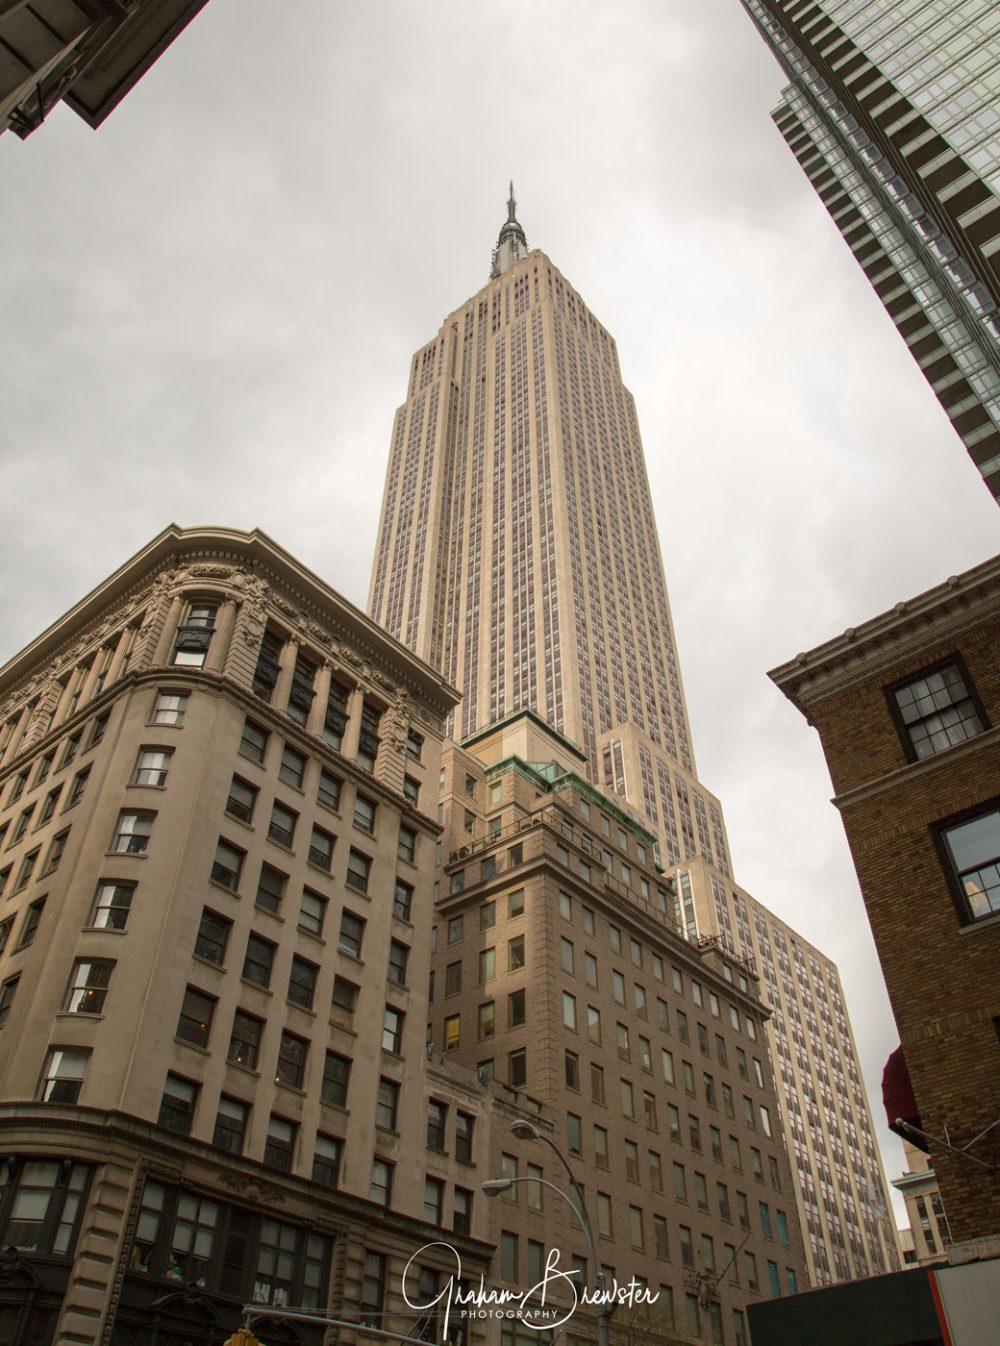 Graham Brewster Photography - New York Prints